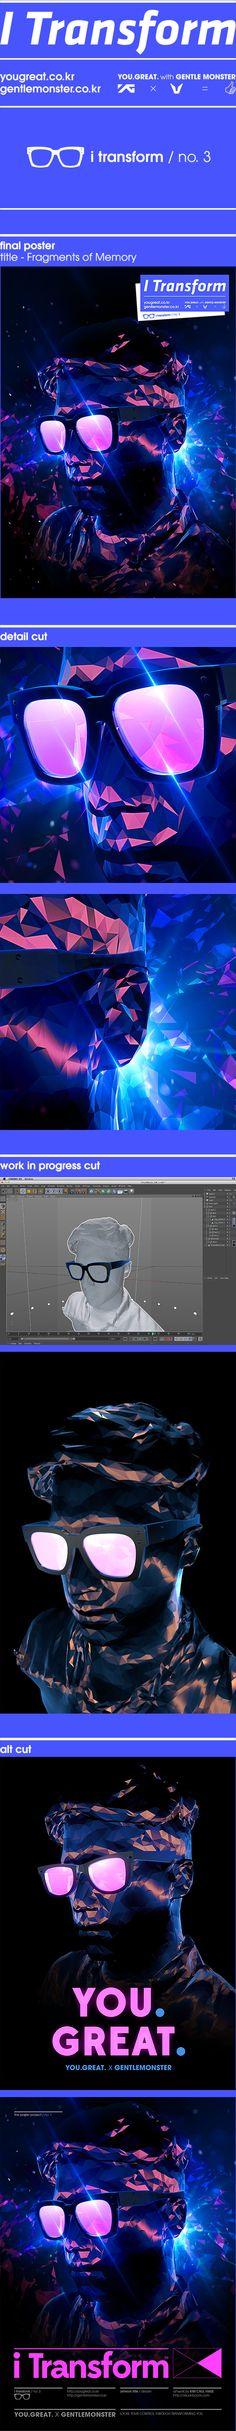 I Transform - Art work relay by Chul hwee Kim, via Behance